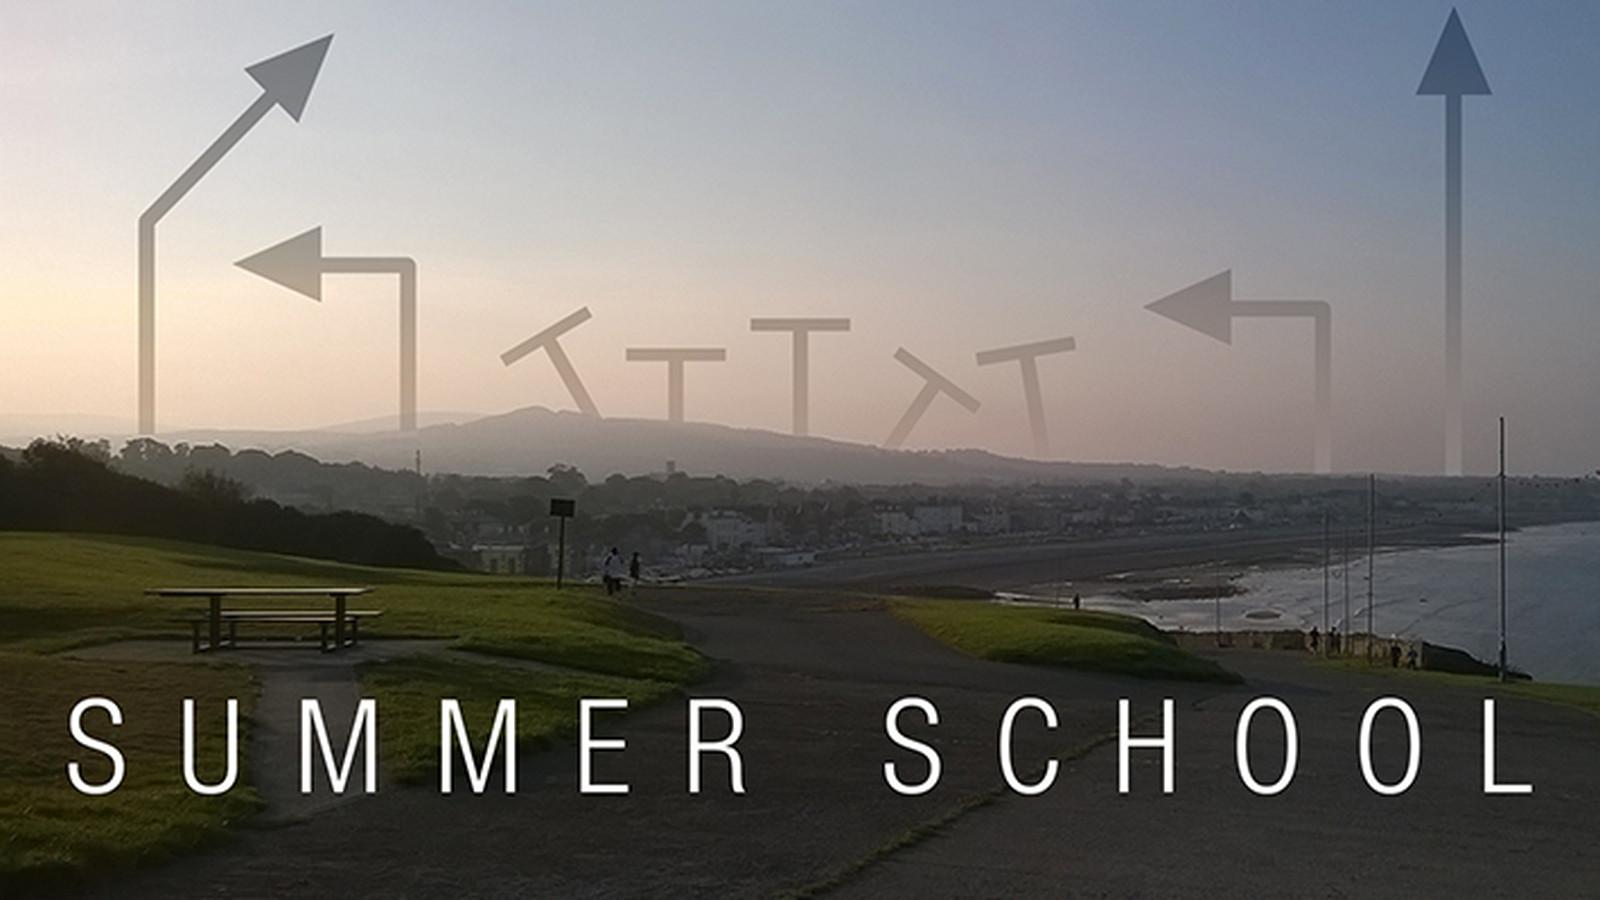 Summerschoolweb.0.0